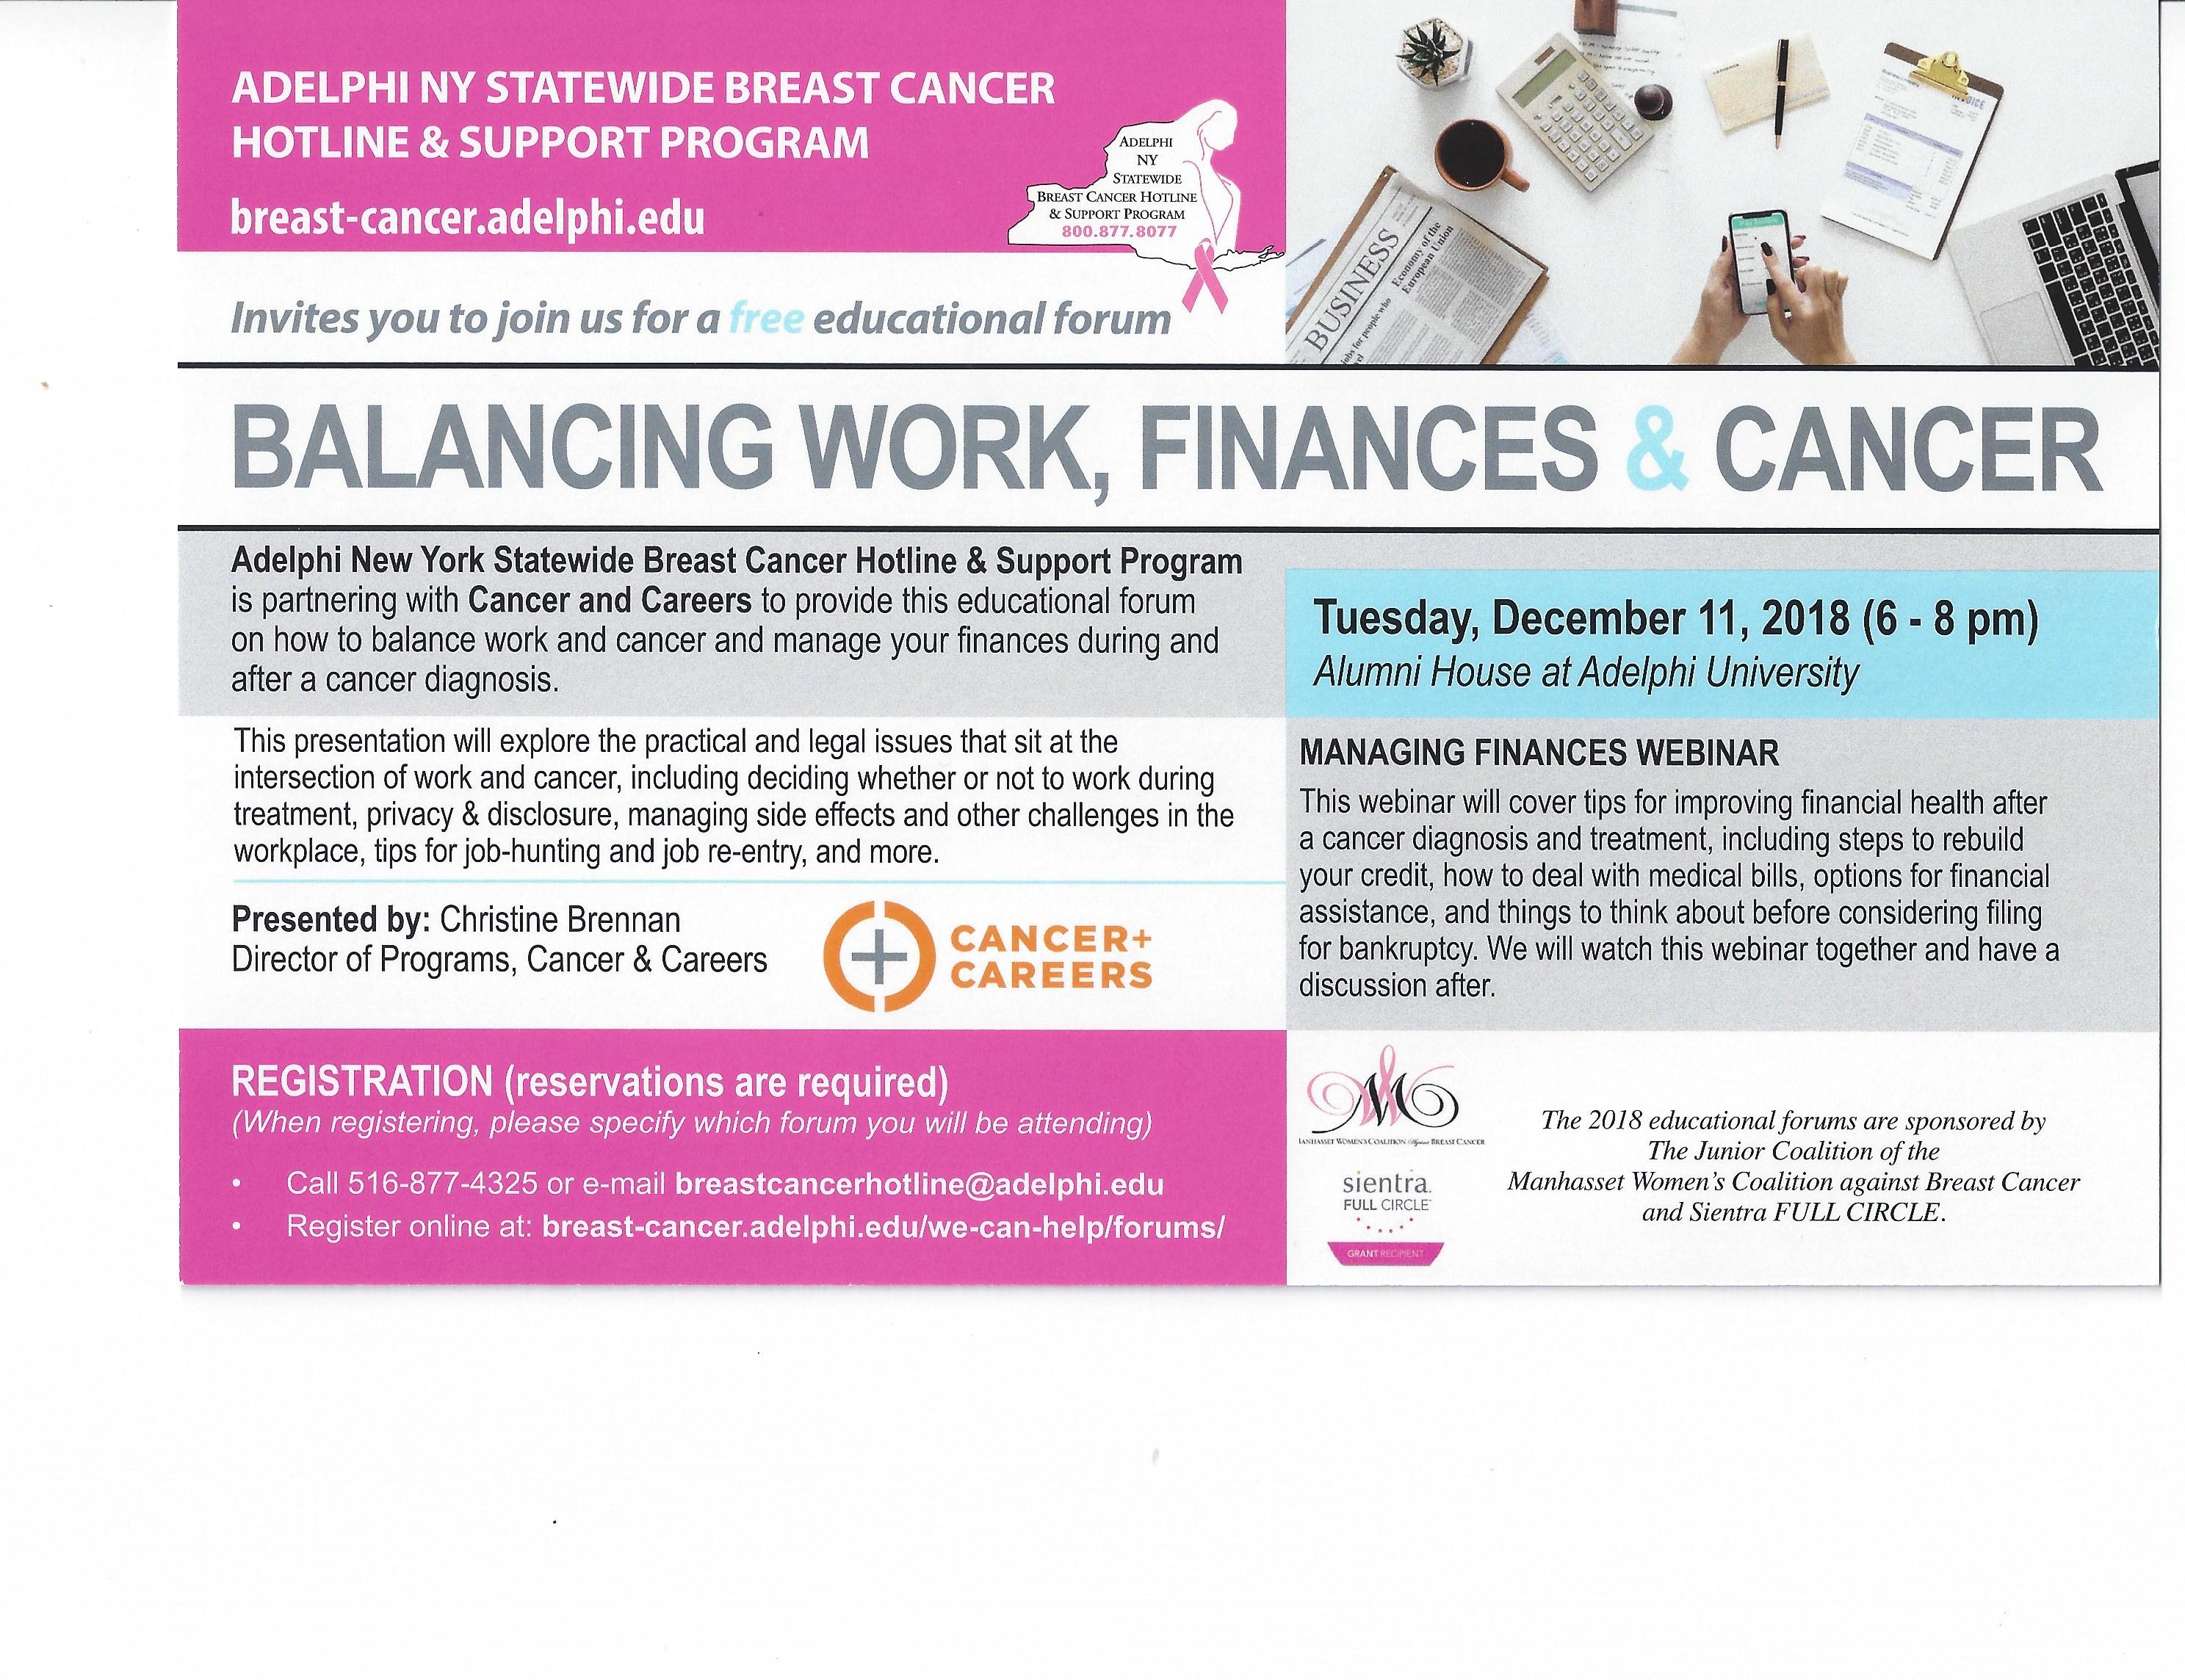 Balancing Work, Finances & Cancer